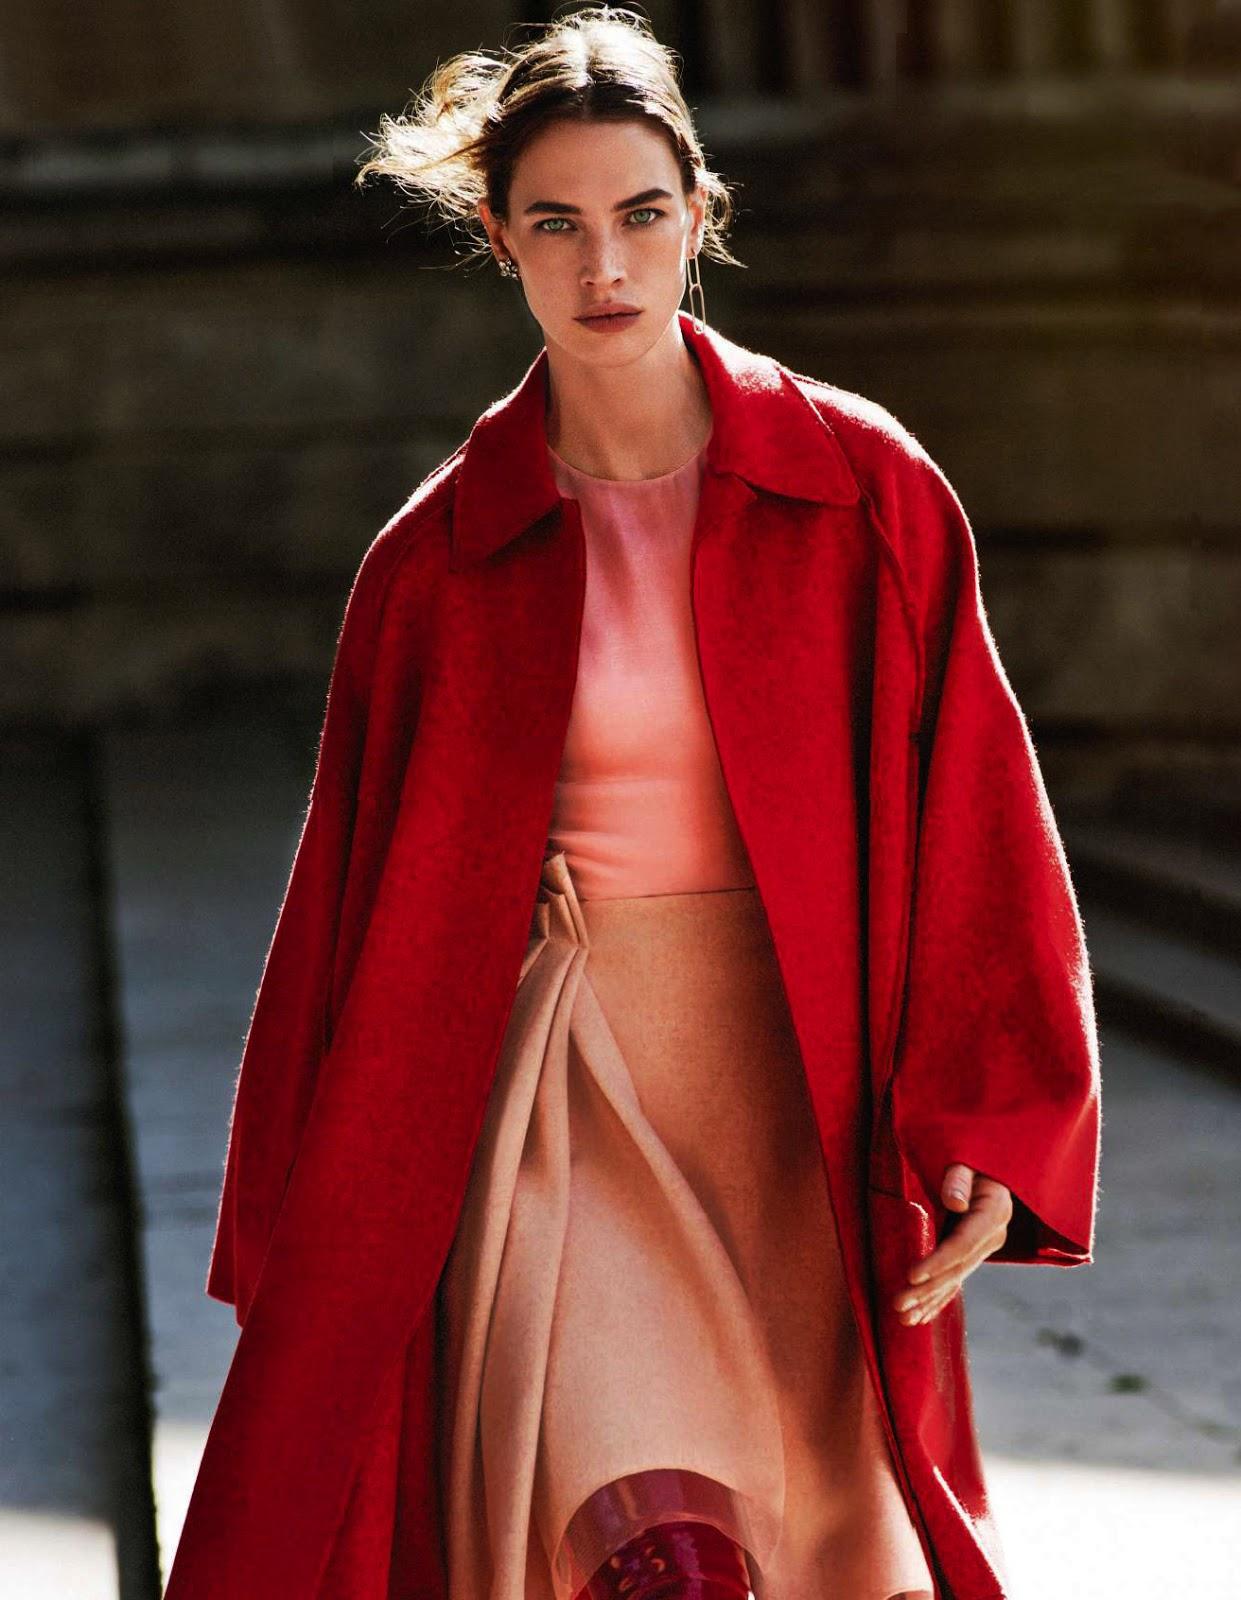 Watch Crista cober numero magazine aug 2015 by txema yeste hq photo shoot video